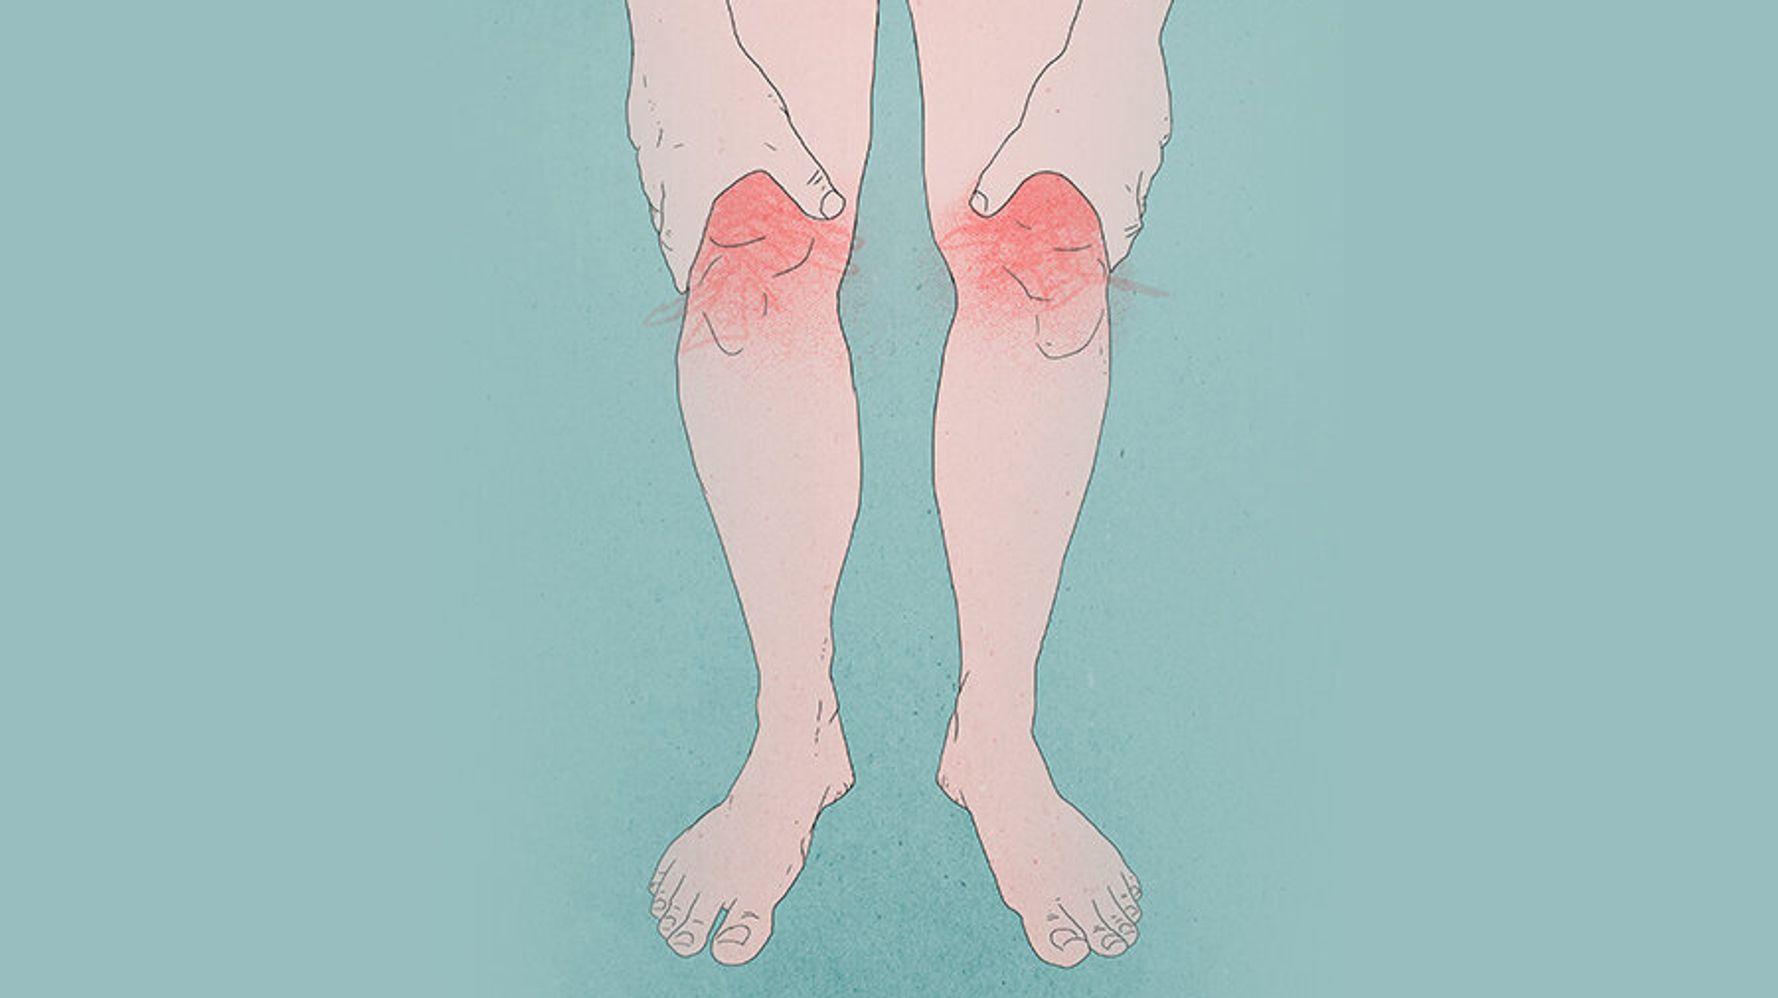 Rheumatoid Arthritis 3 Millennials On Growing Up With Chronic Pain Huffpost Uk Life